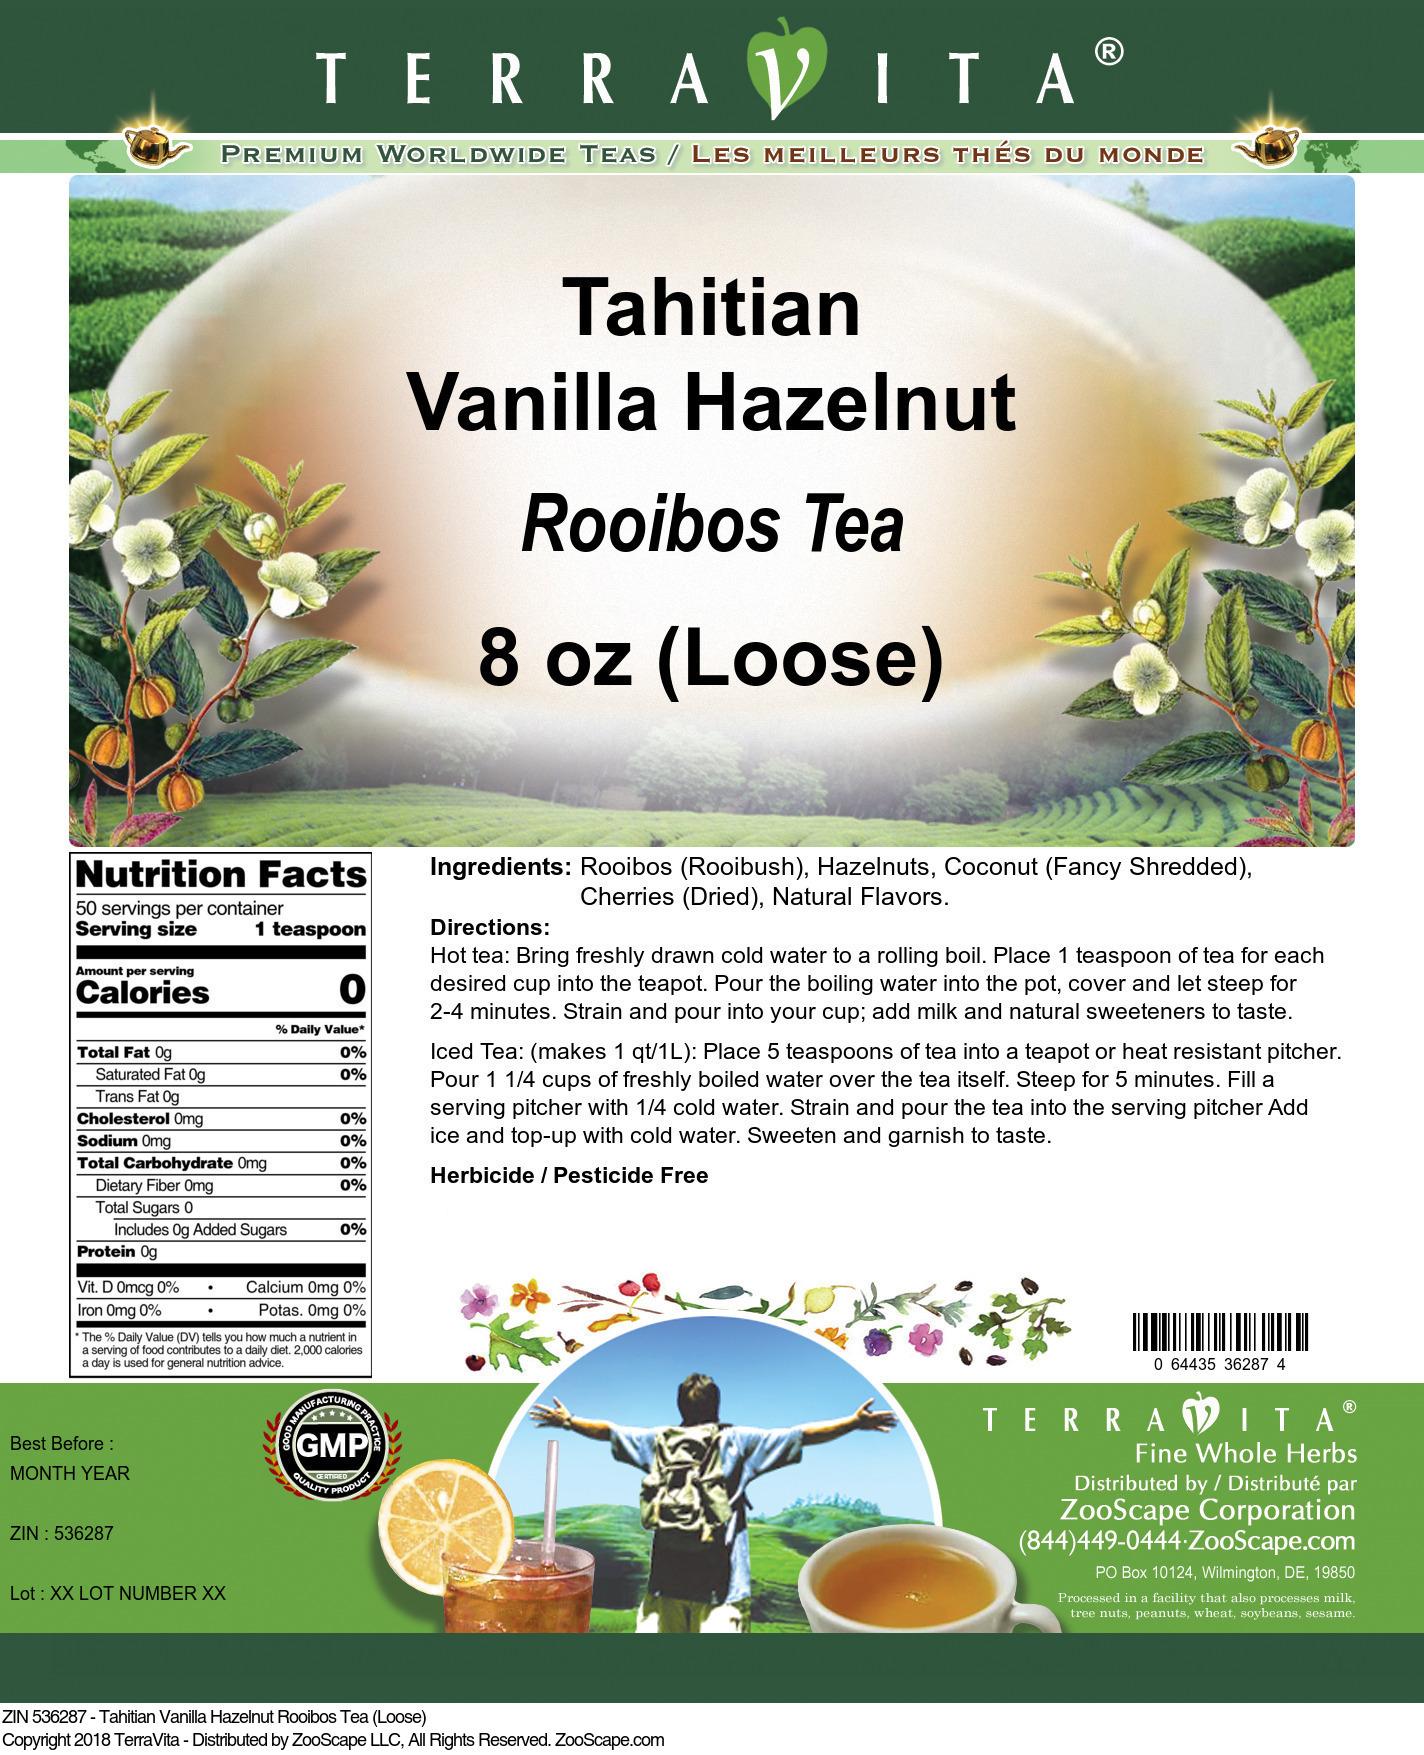 Tahitian Vanilla Hazelnut Rooibos Tea (Loose)